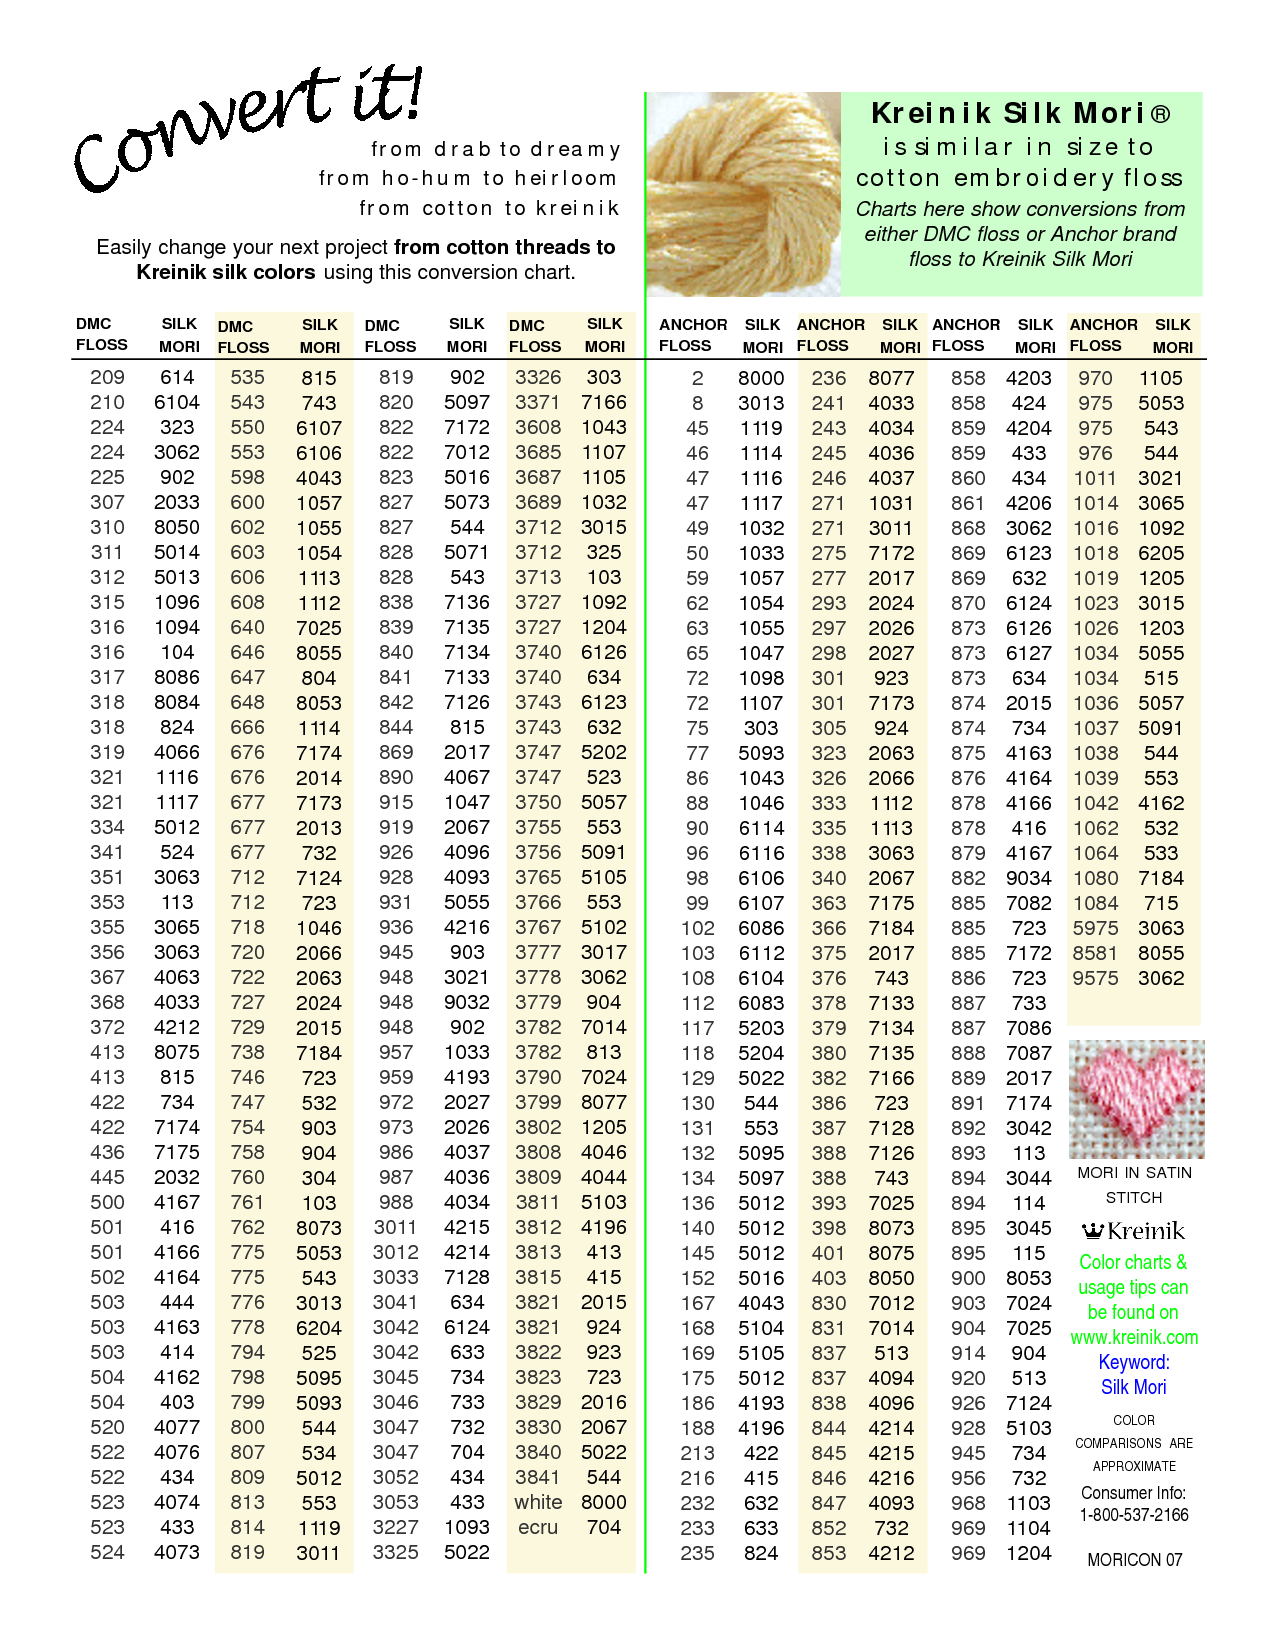 Mori Conversion By Zhangsshaohui123 Cross Stitch Samplers Conversion Chart Xstitch Patterns